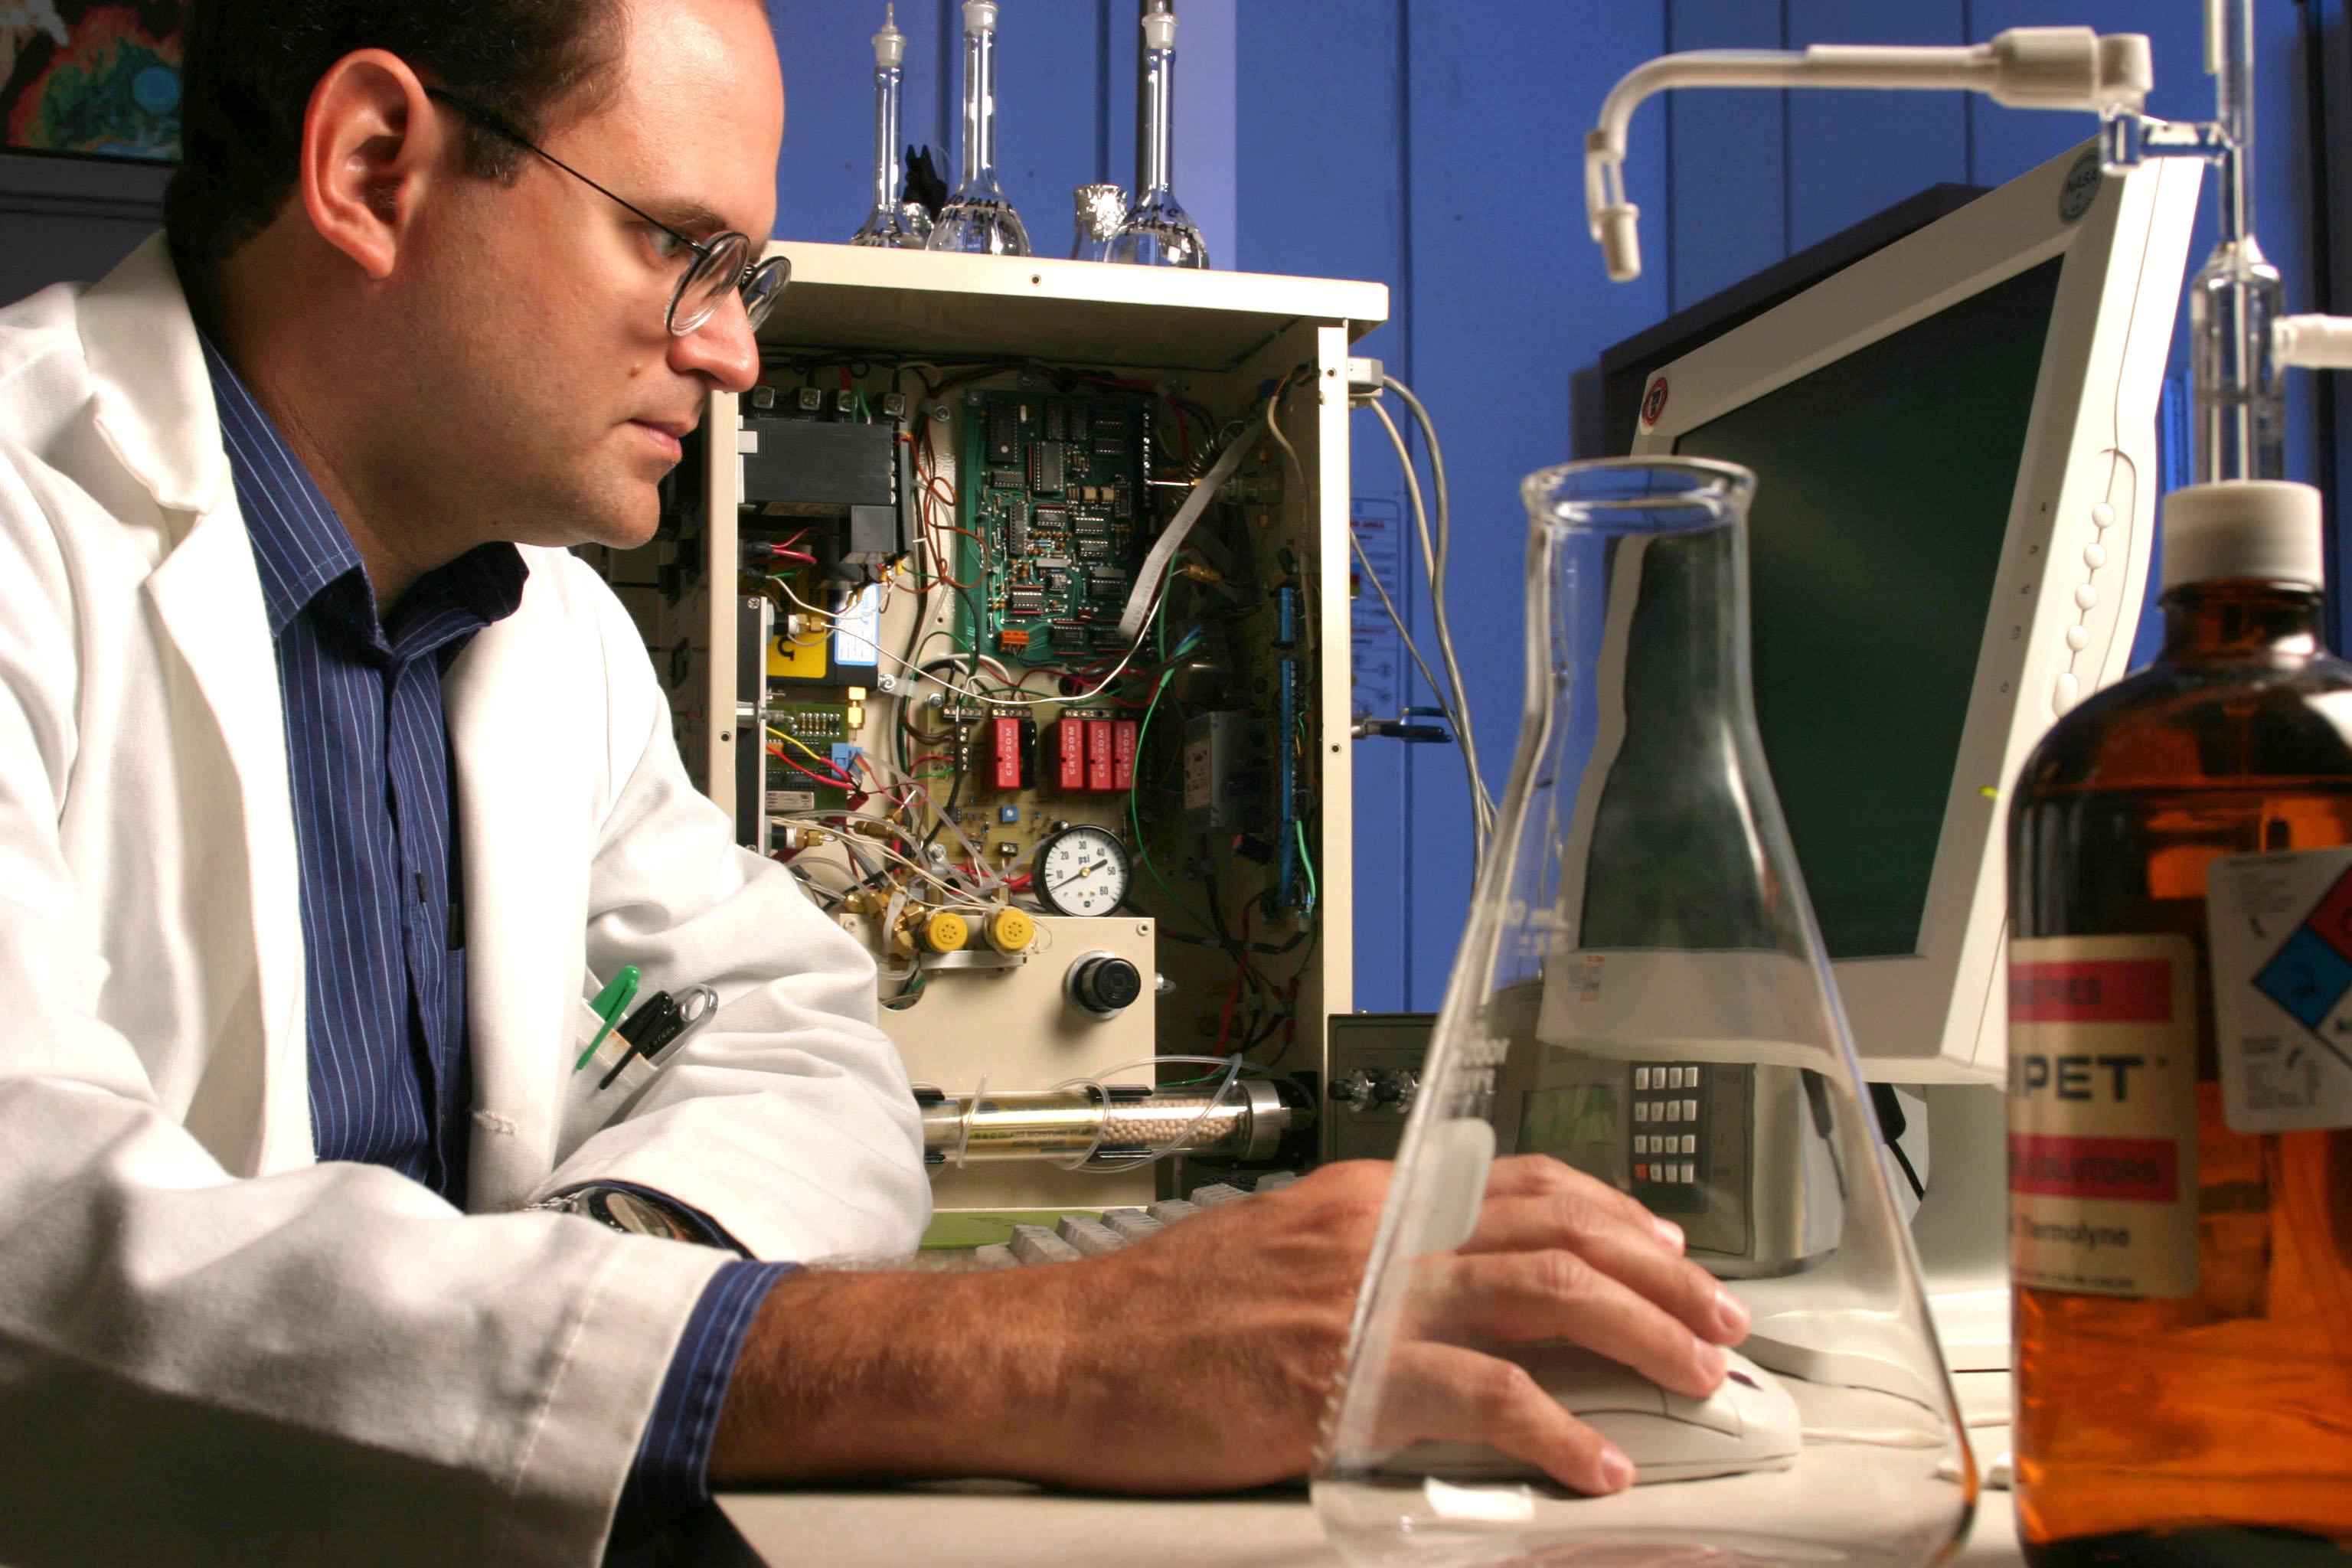 nasa scientist - photo #1